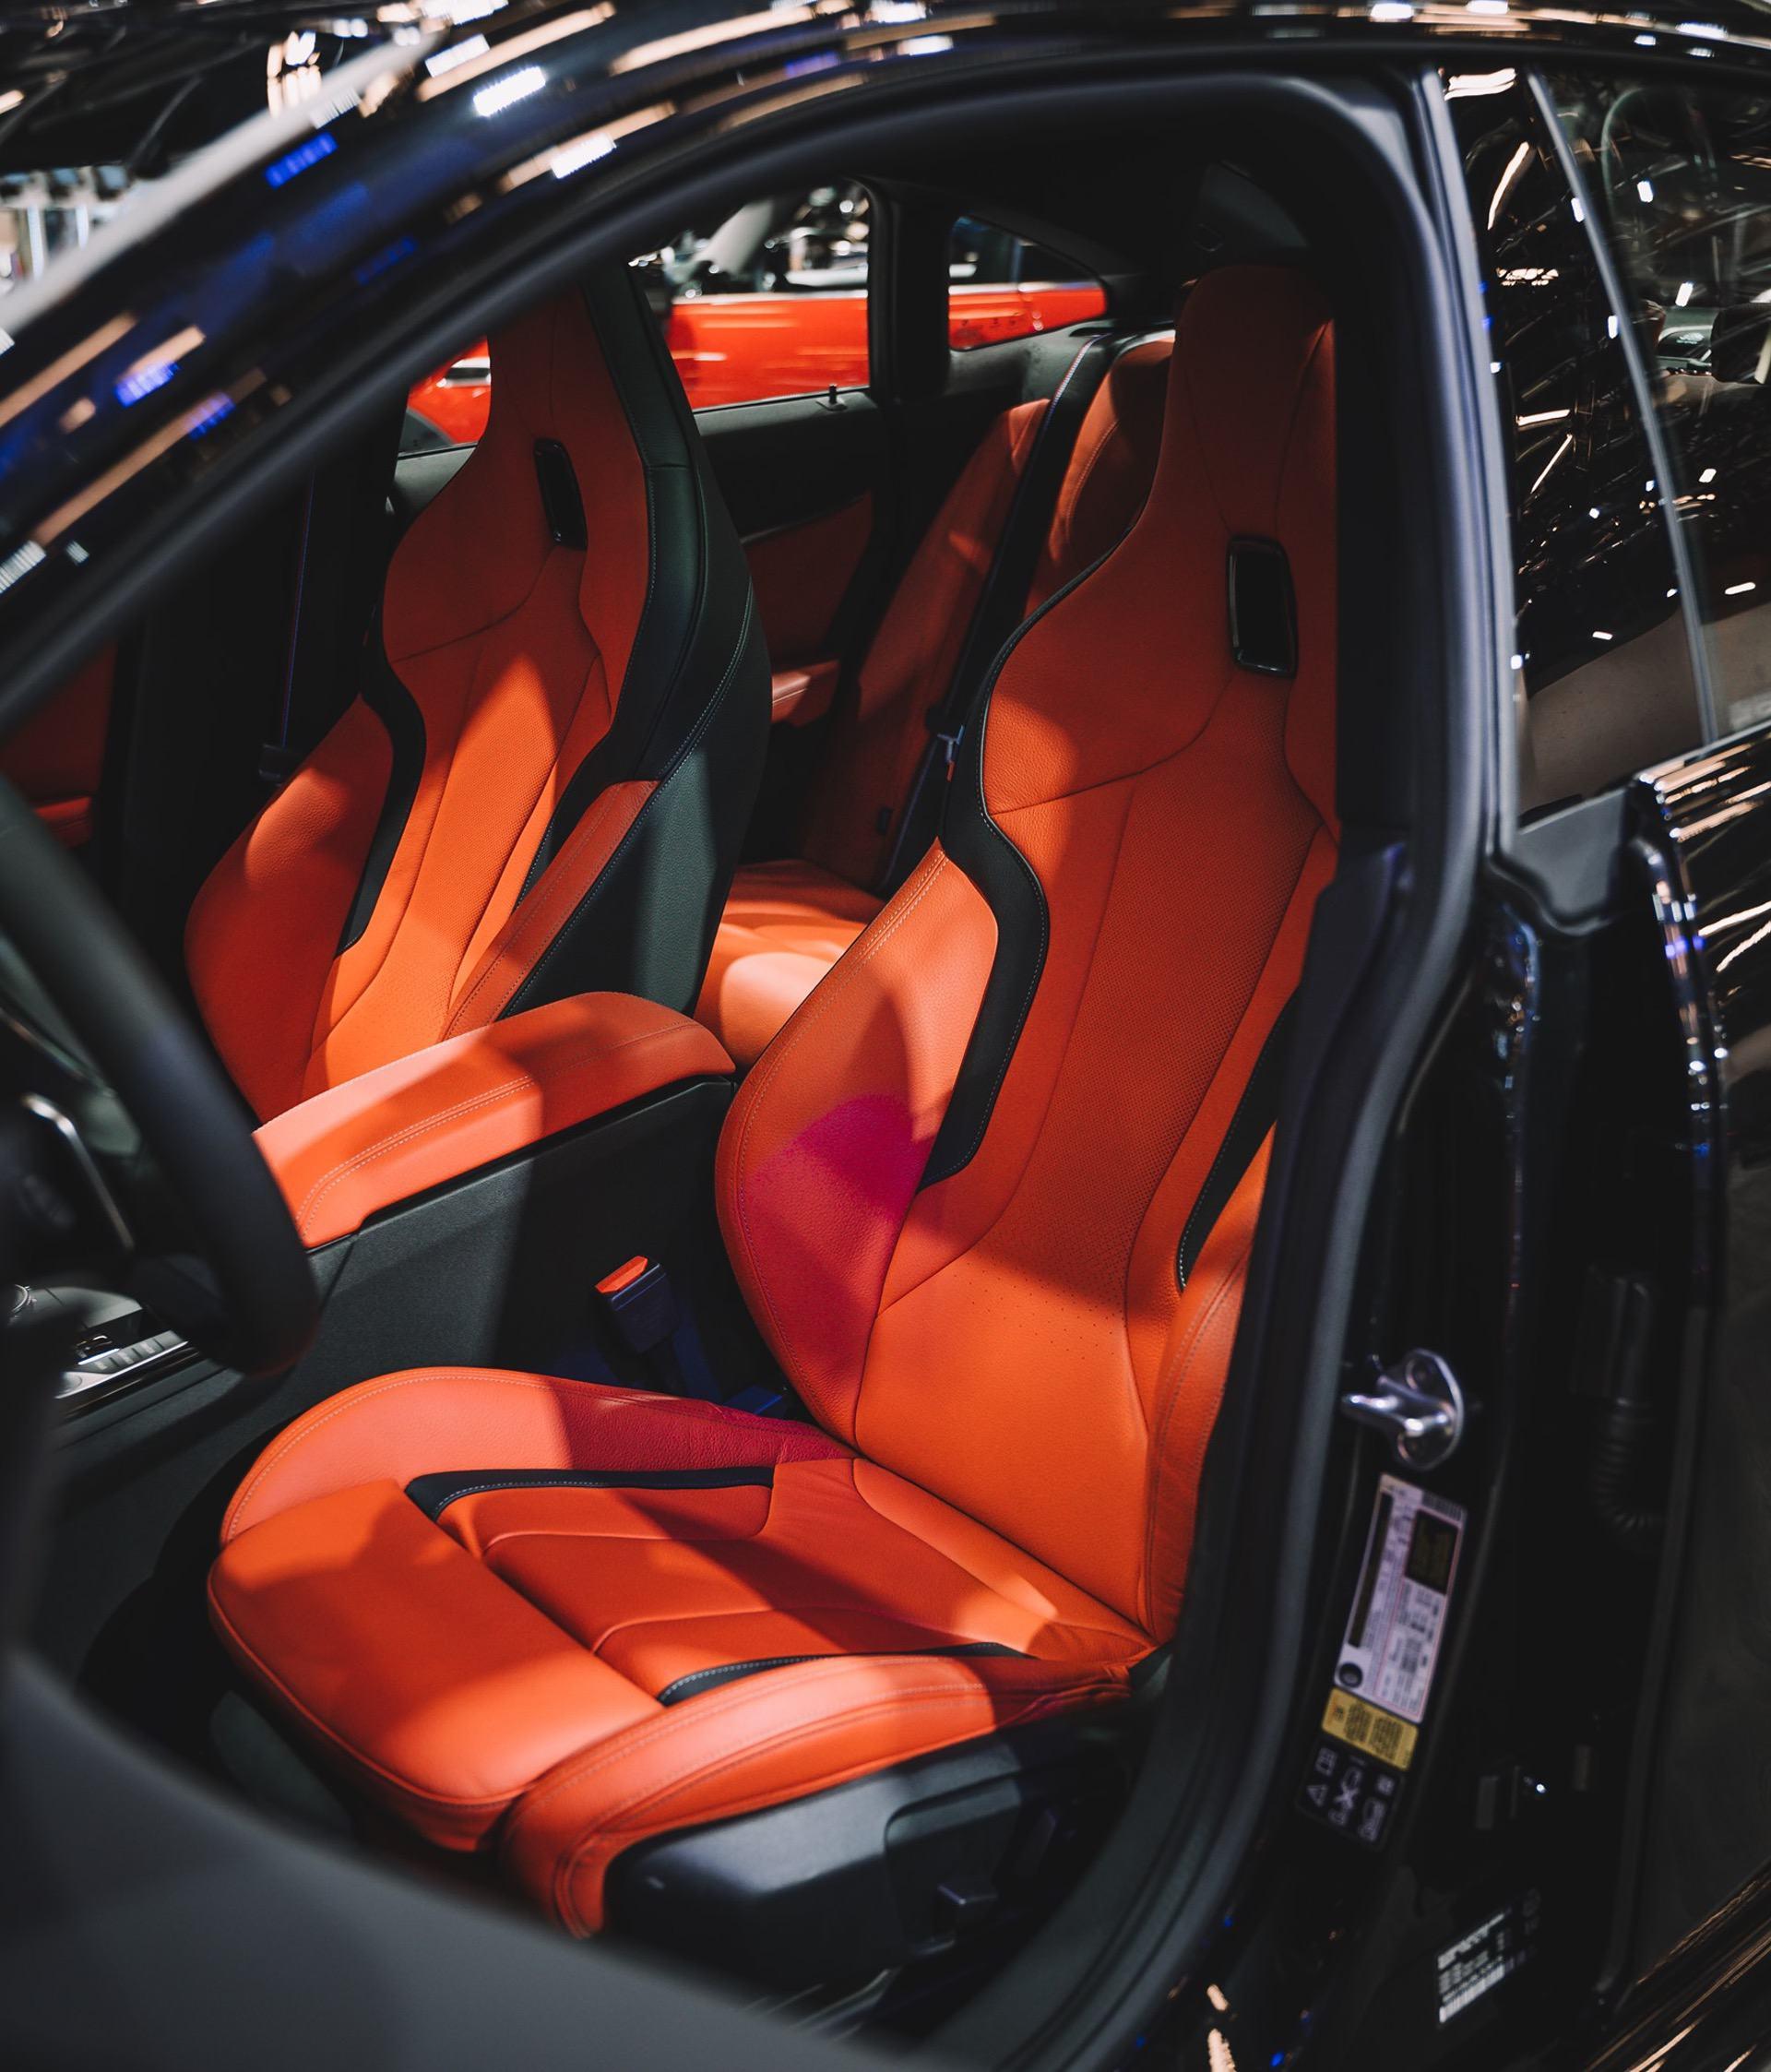 Bmw 2 Series Gran Coupe In Sapphire Black Looks Pretty Good Motor Sport Hq